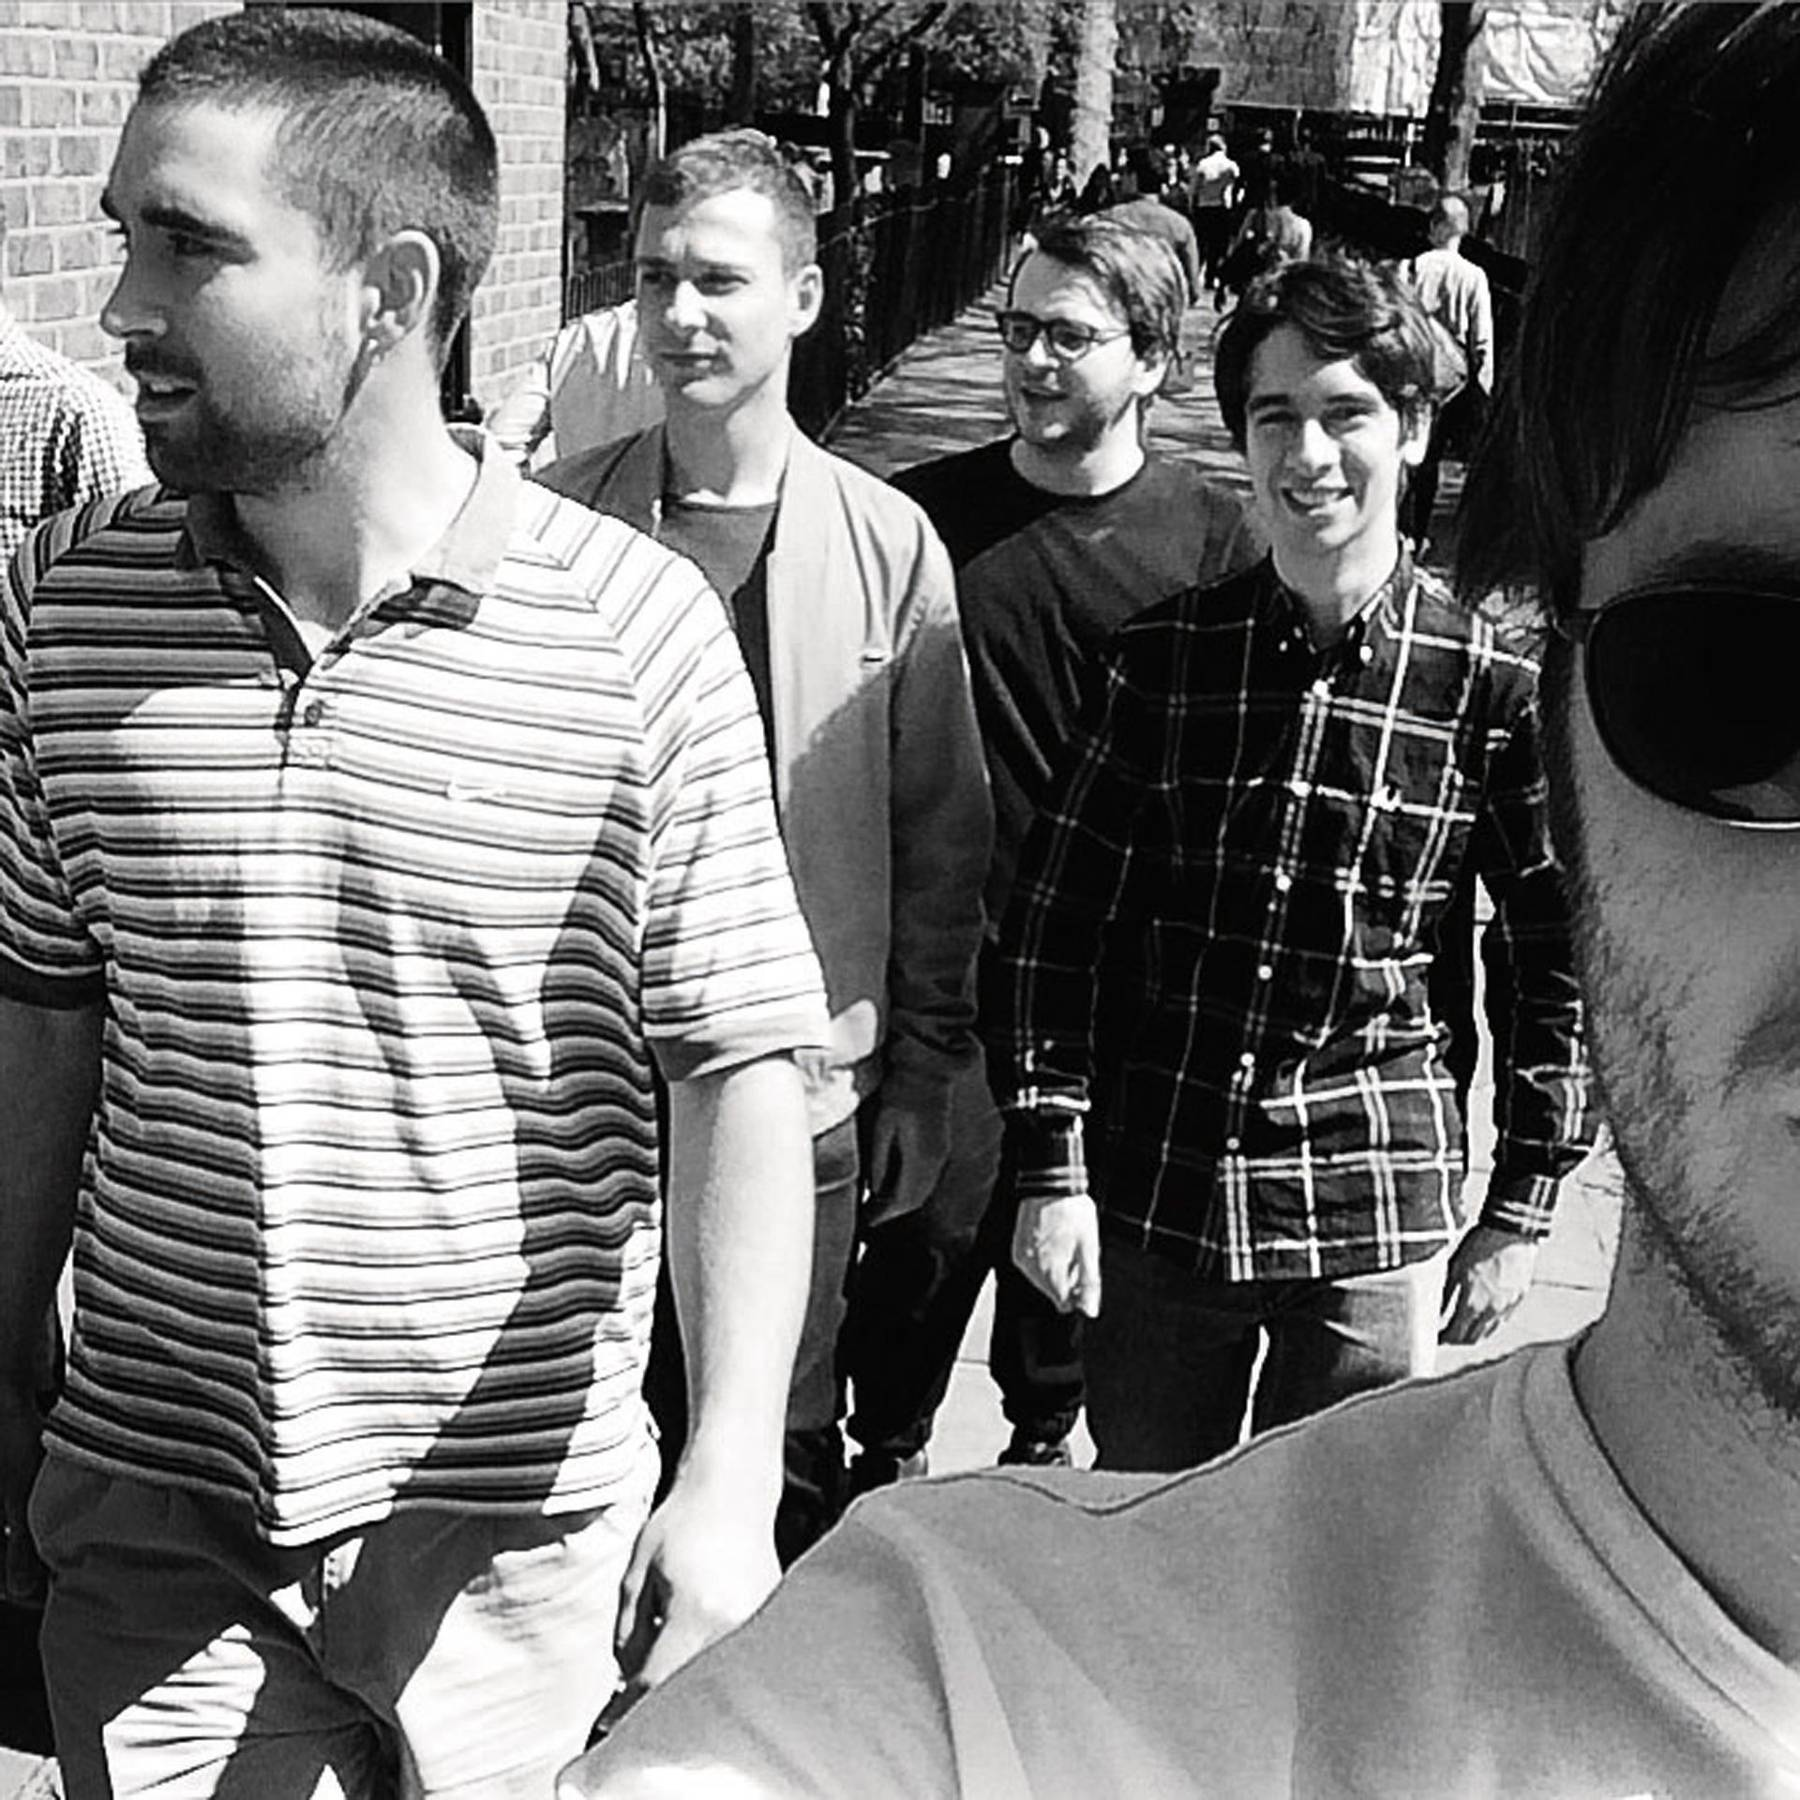 Metrosexuals lads